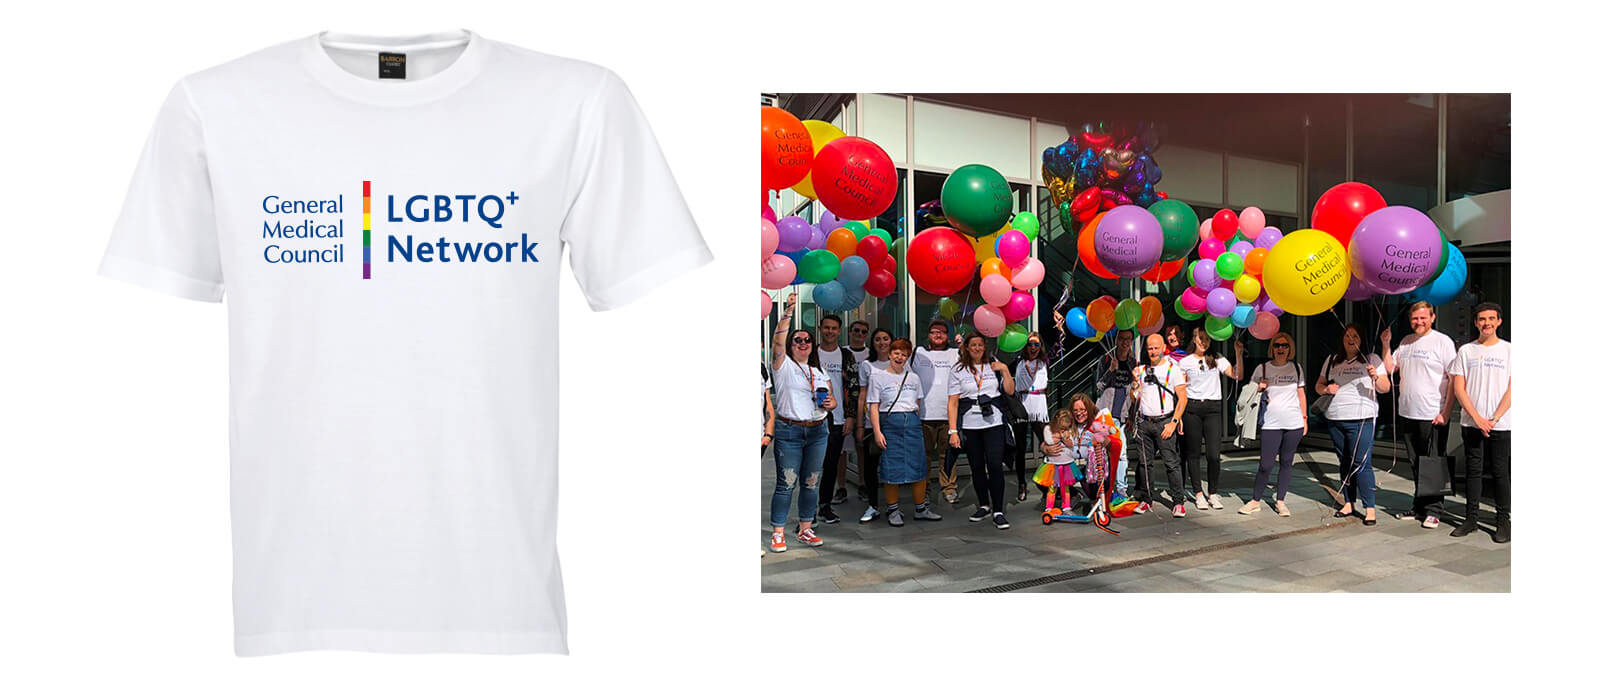 LGBT network tee